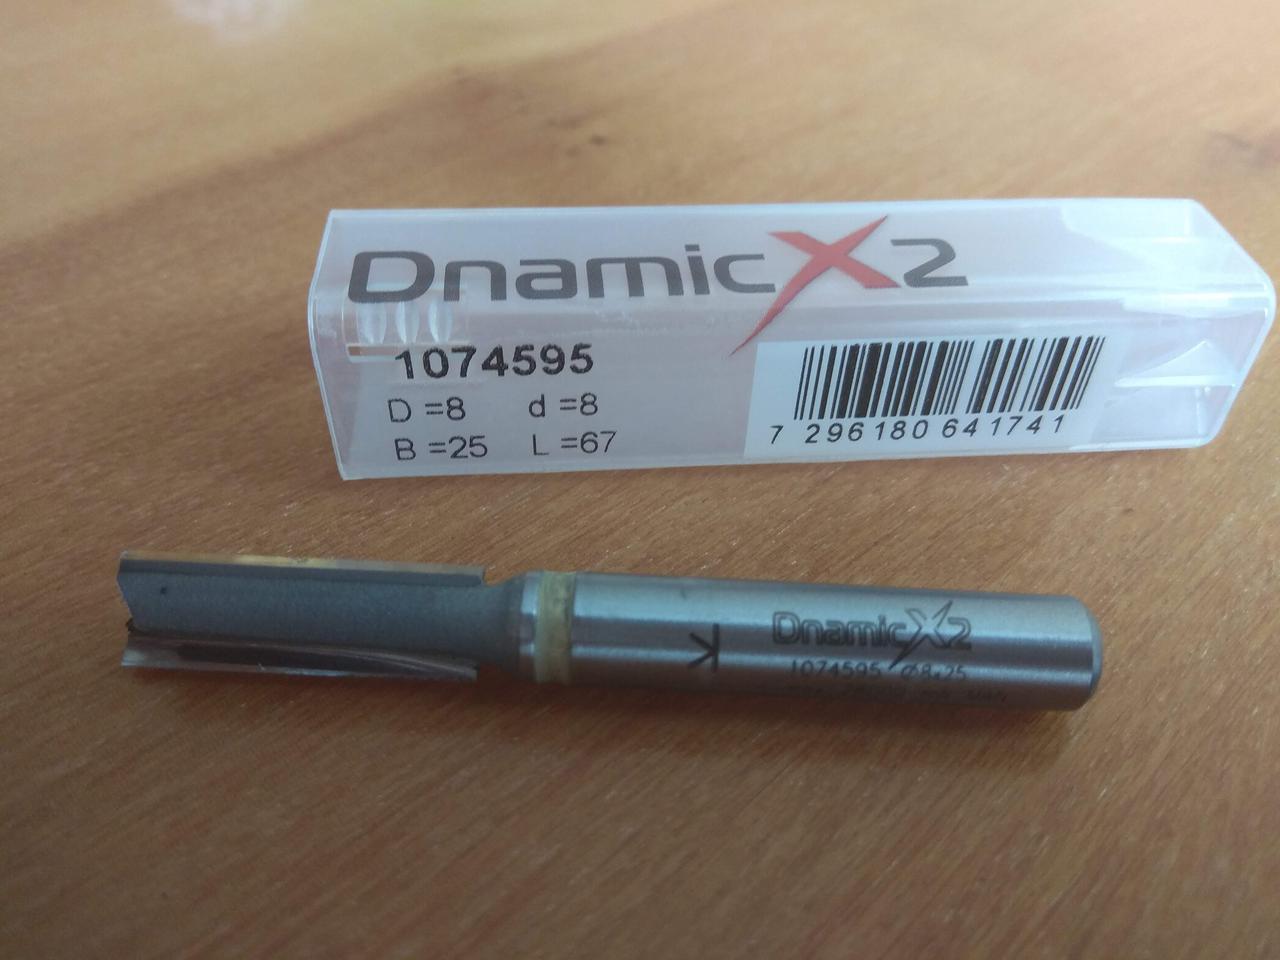 Фреза пряма DIMAR Dnamicx2 D=8 B=25 L=67 d=8